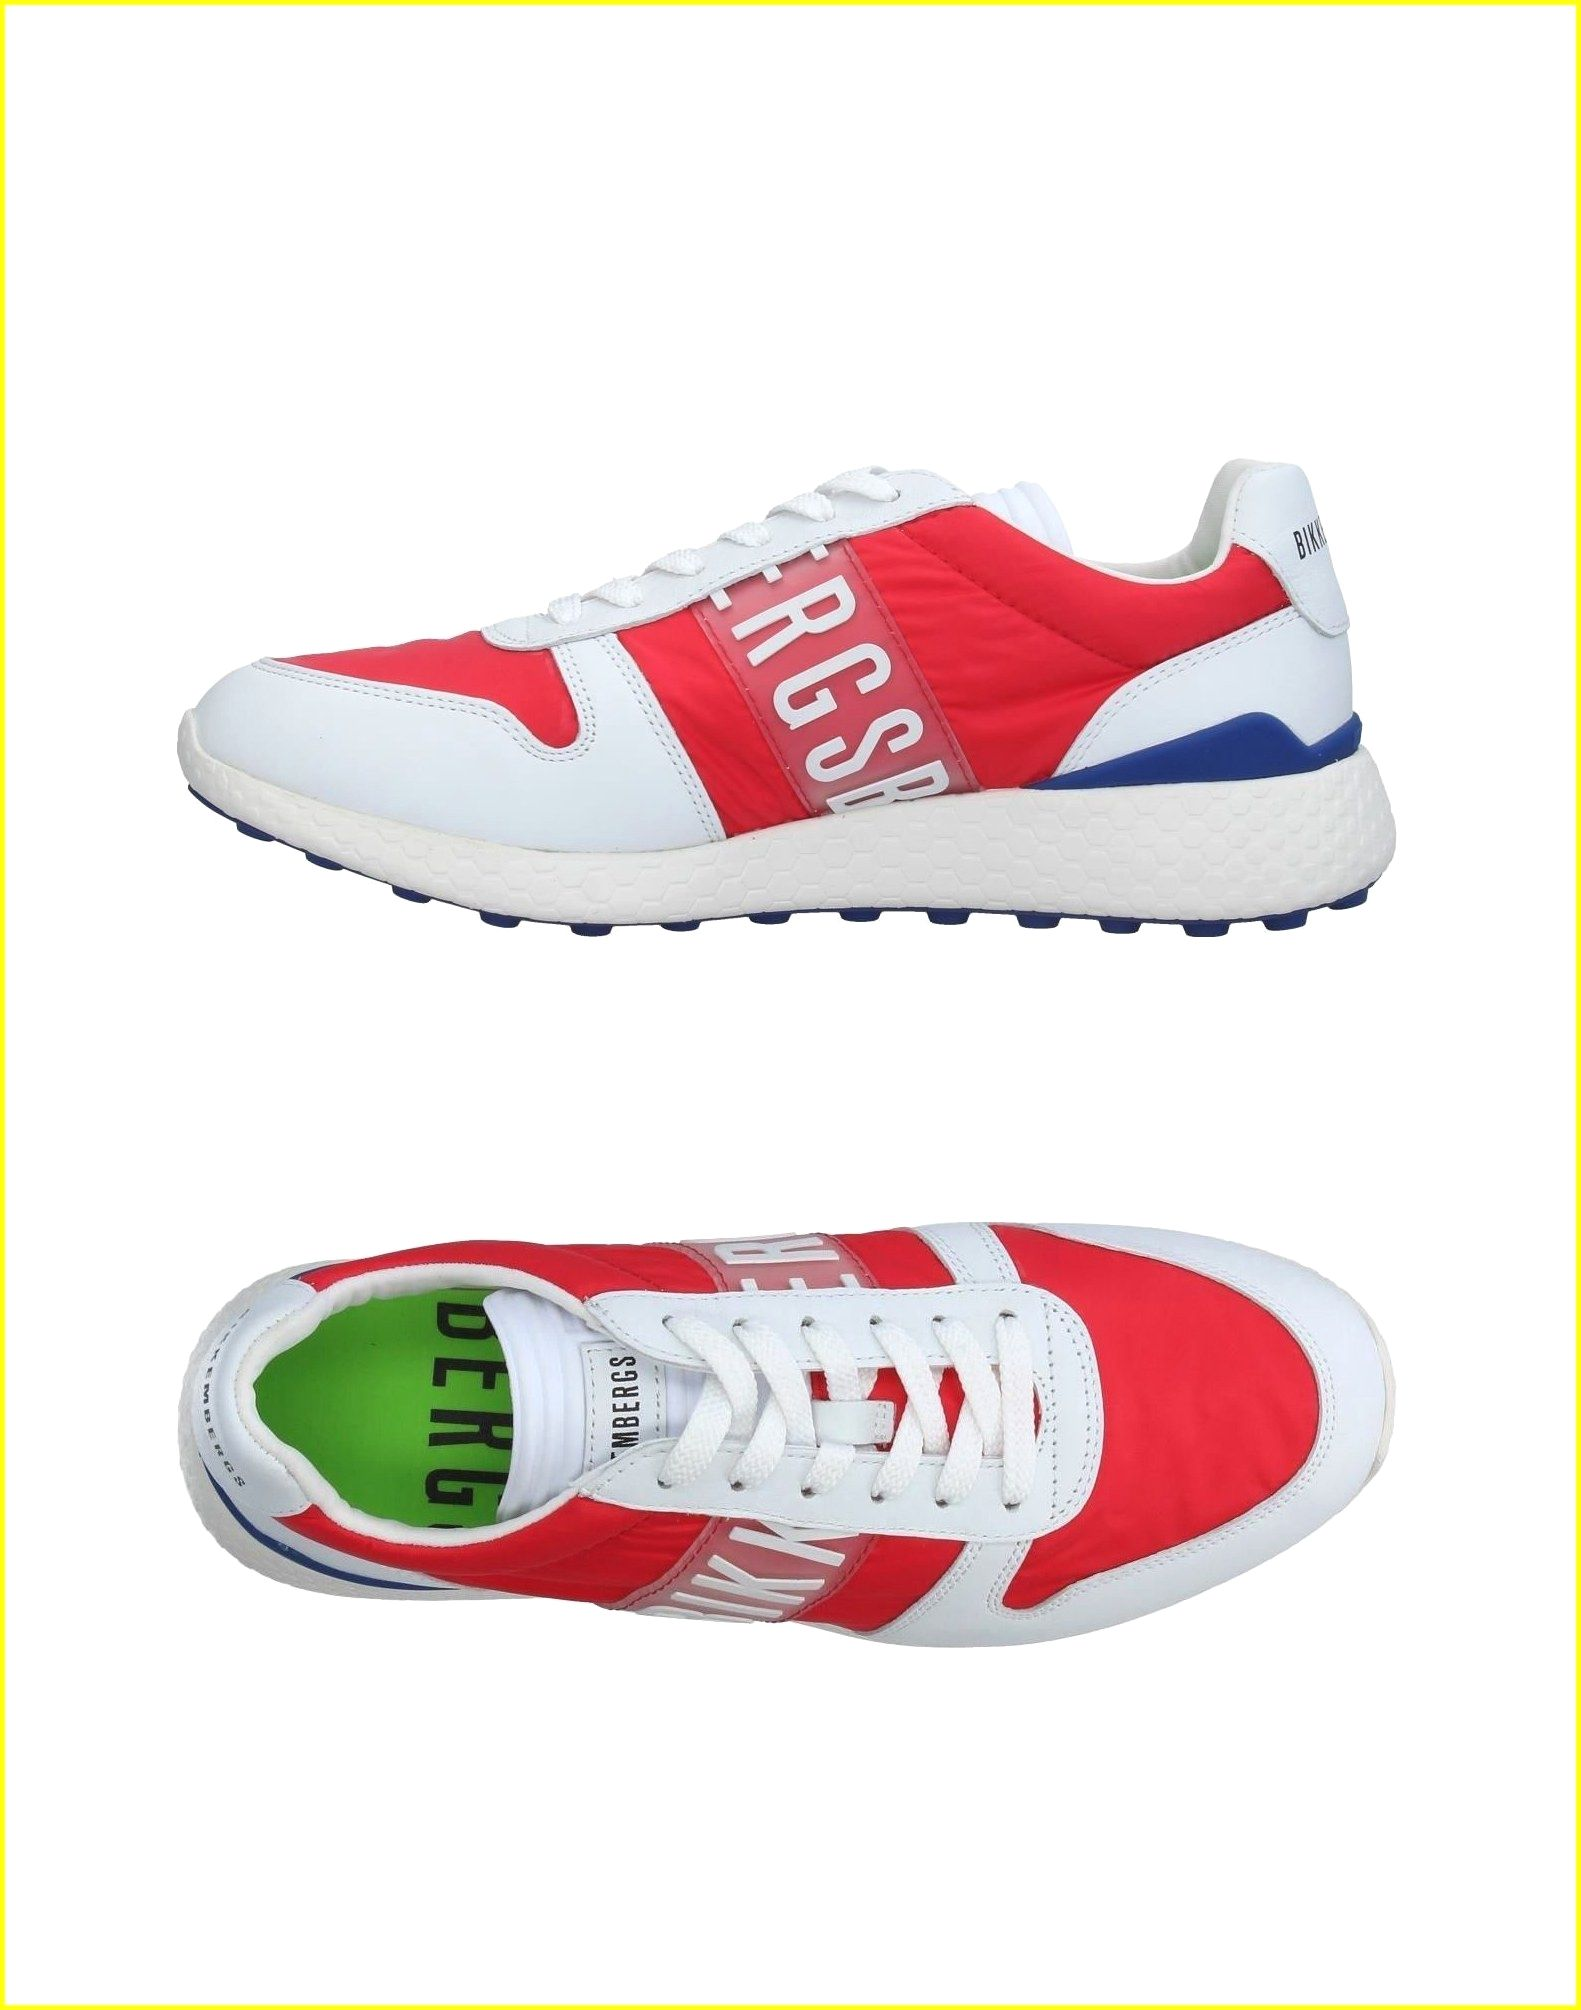 Sneakers men fashion, Sneakers